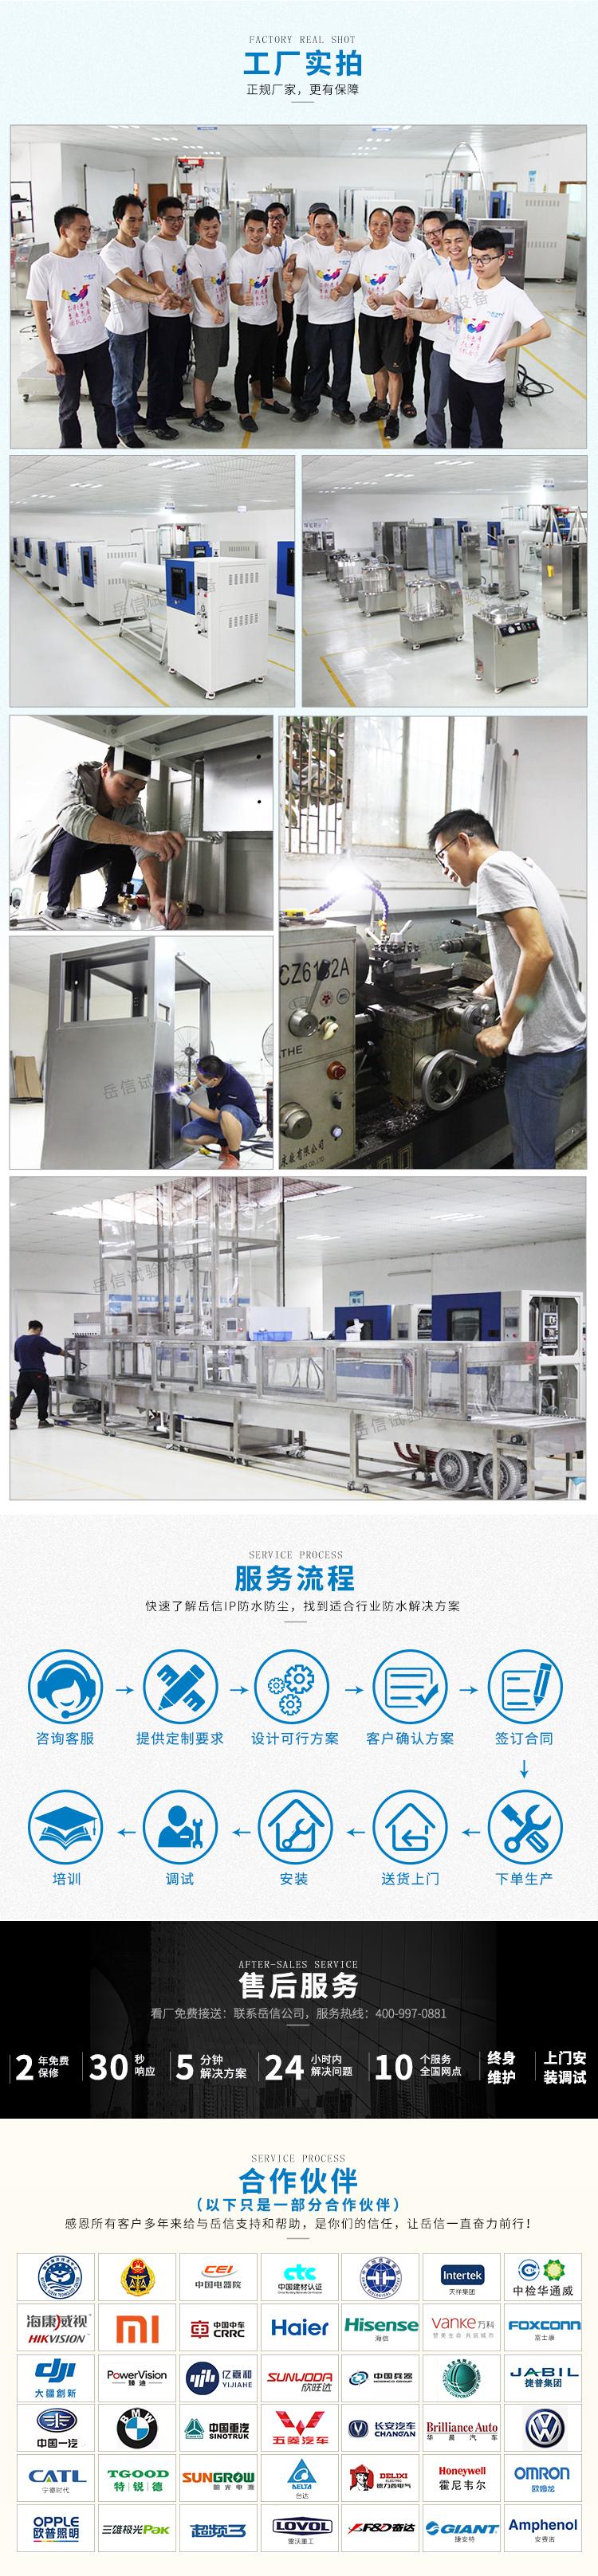 ipx12滴水试验装设备